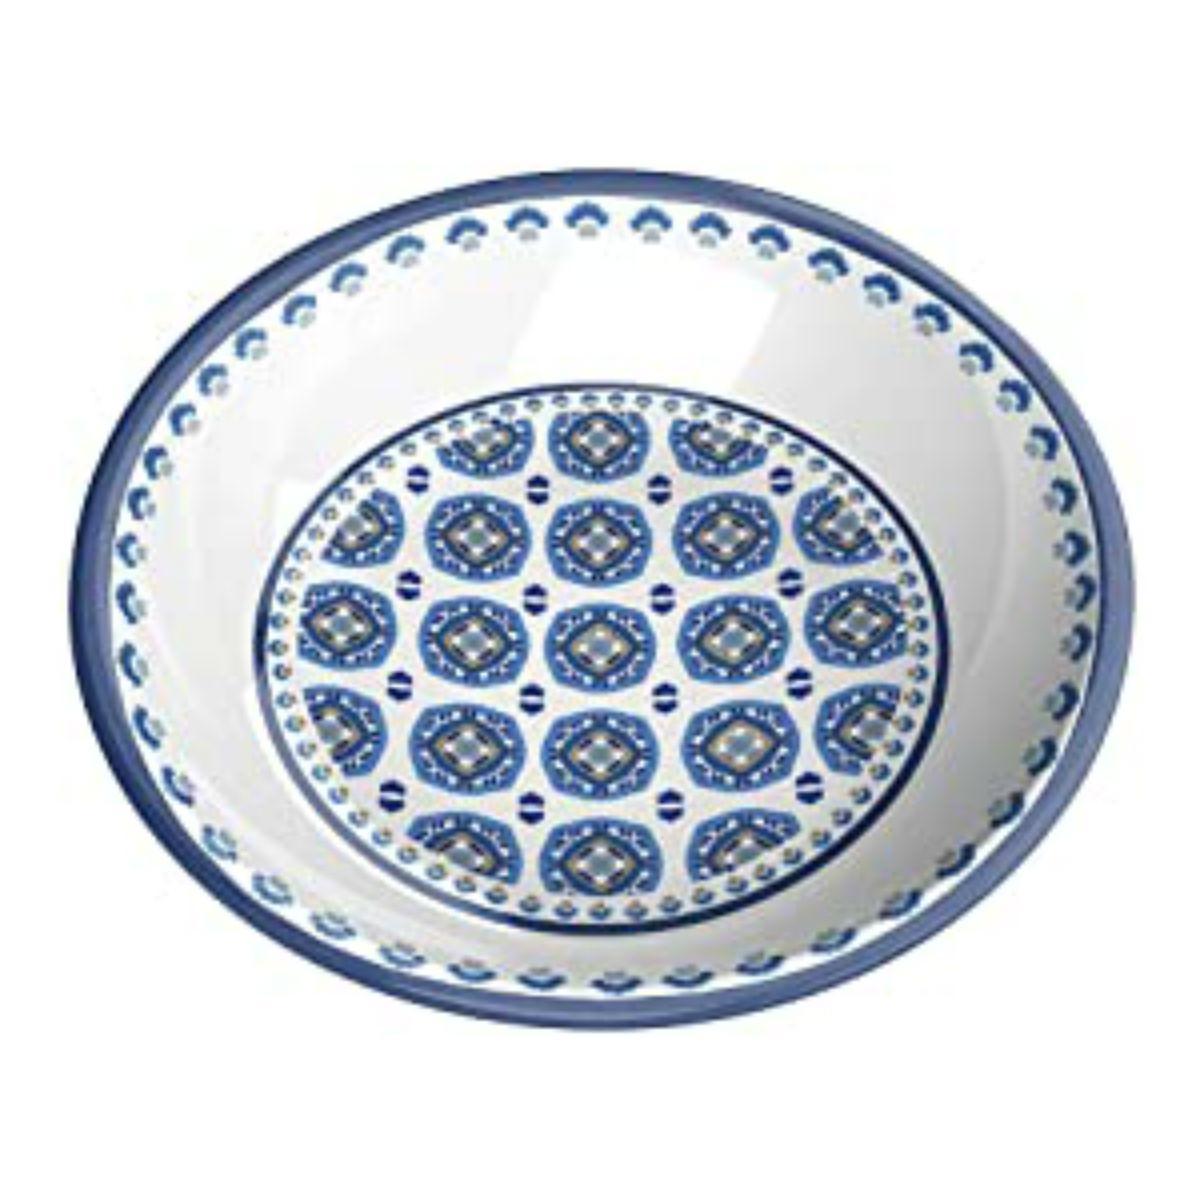 Moroccan Blue Cat Saucer by TarHong - Indigo